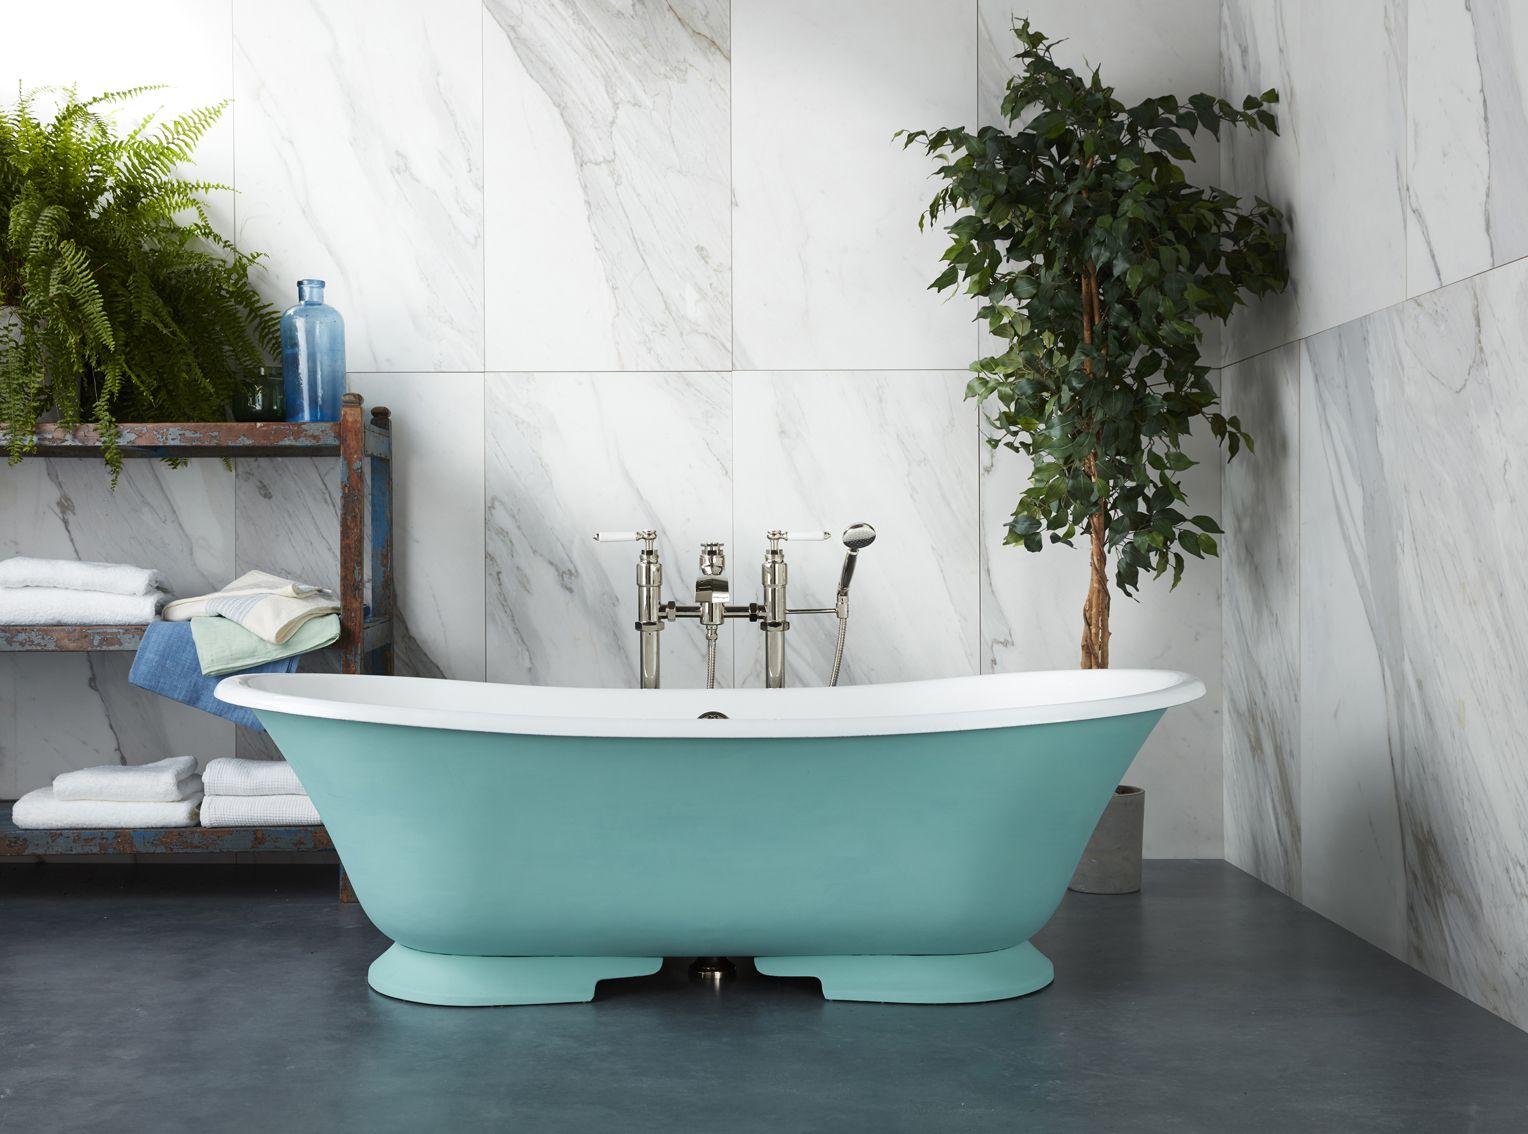 Drummonds\' Serpentine cast iron bath has a very distinctive low ...